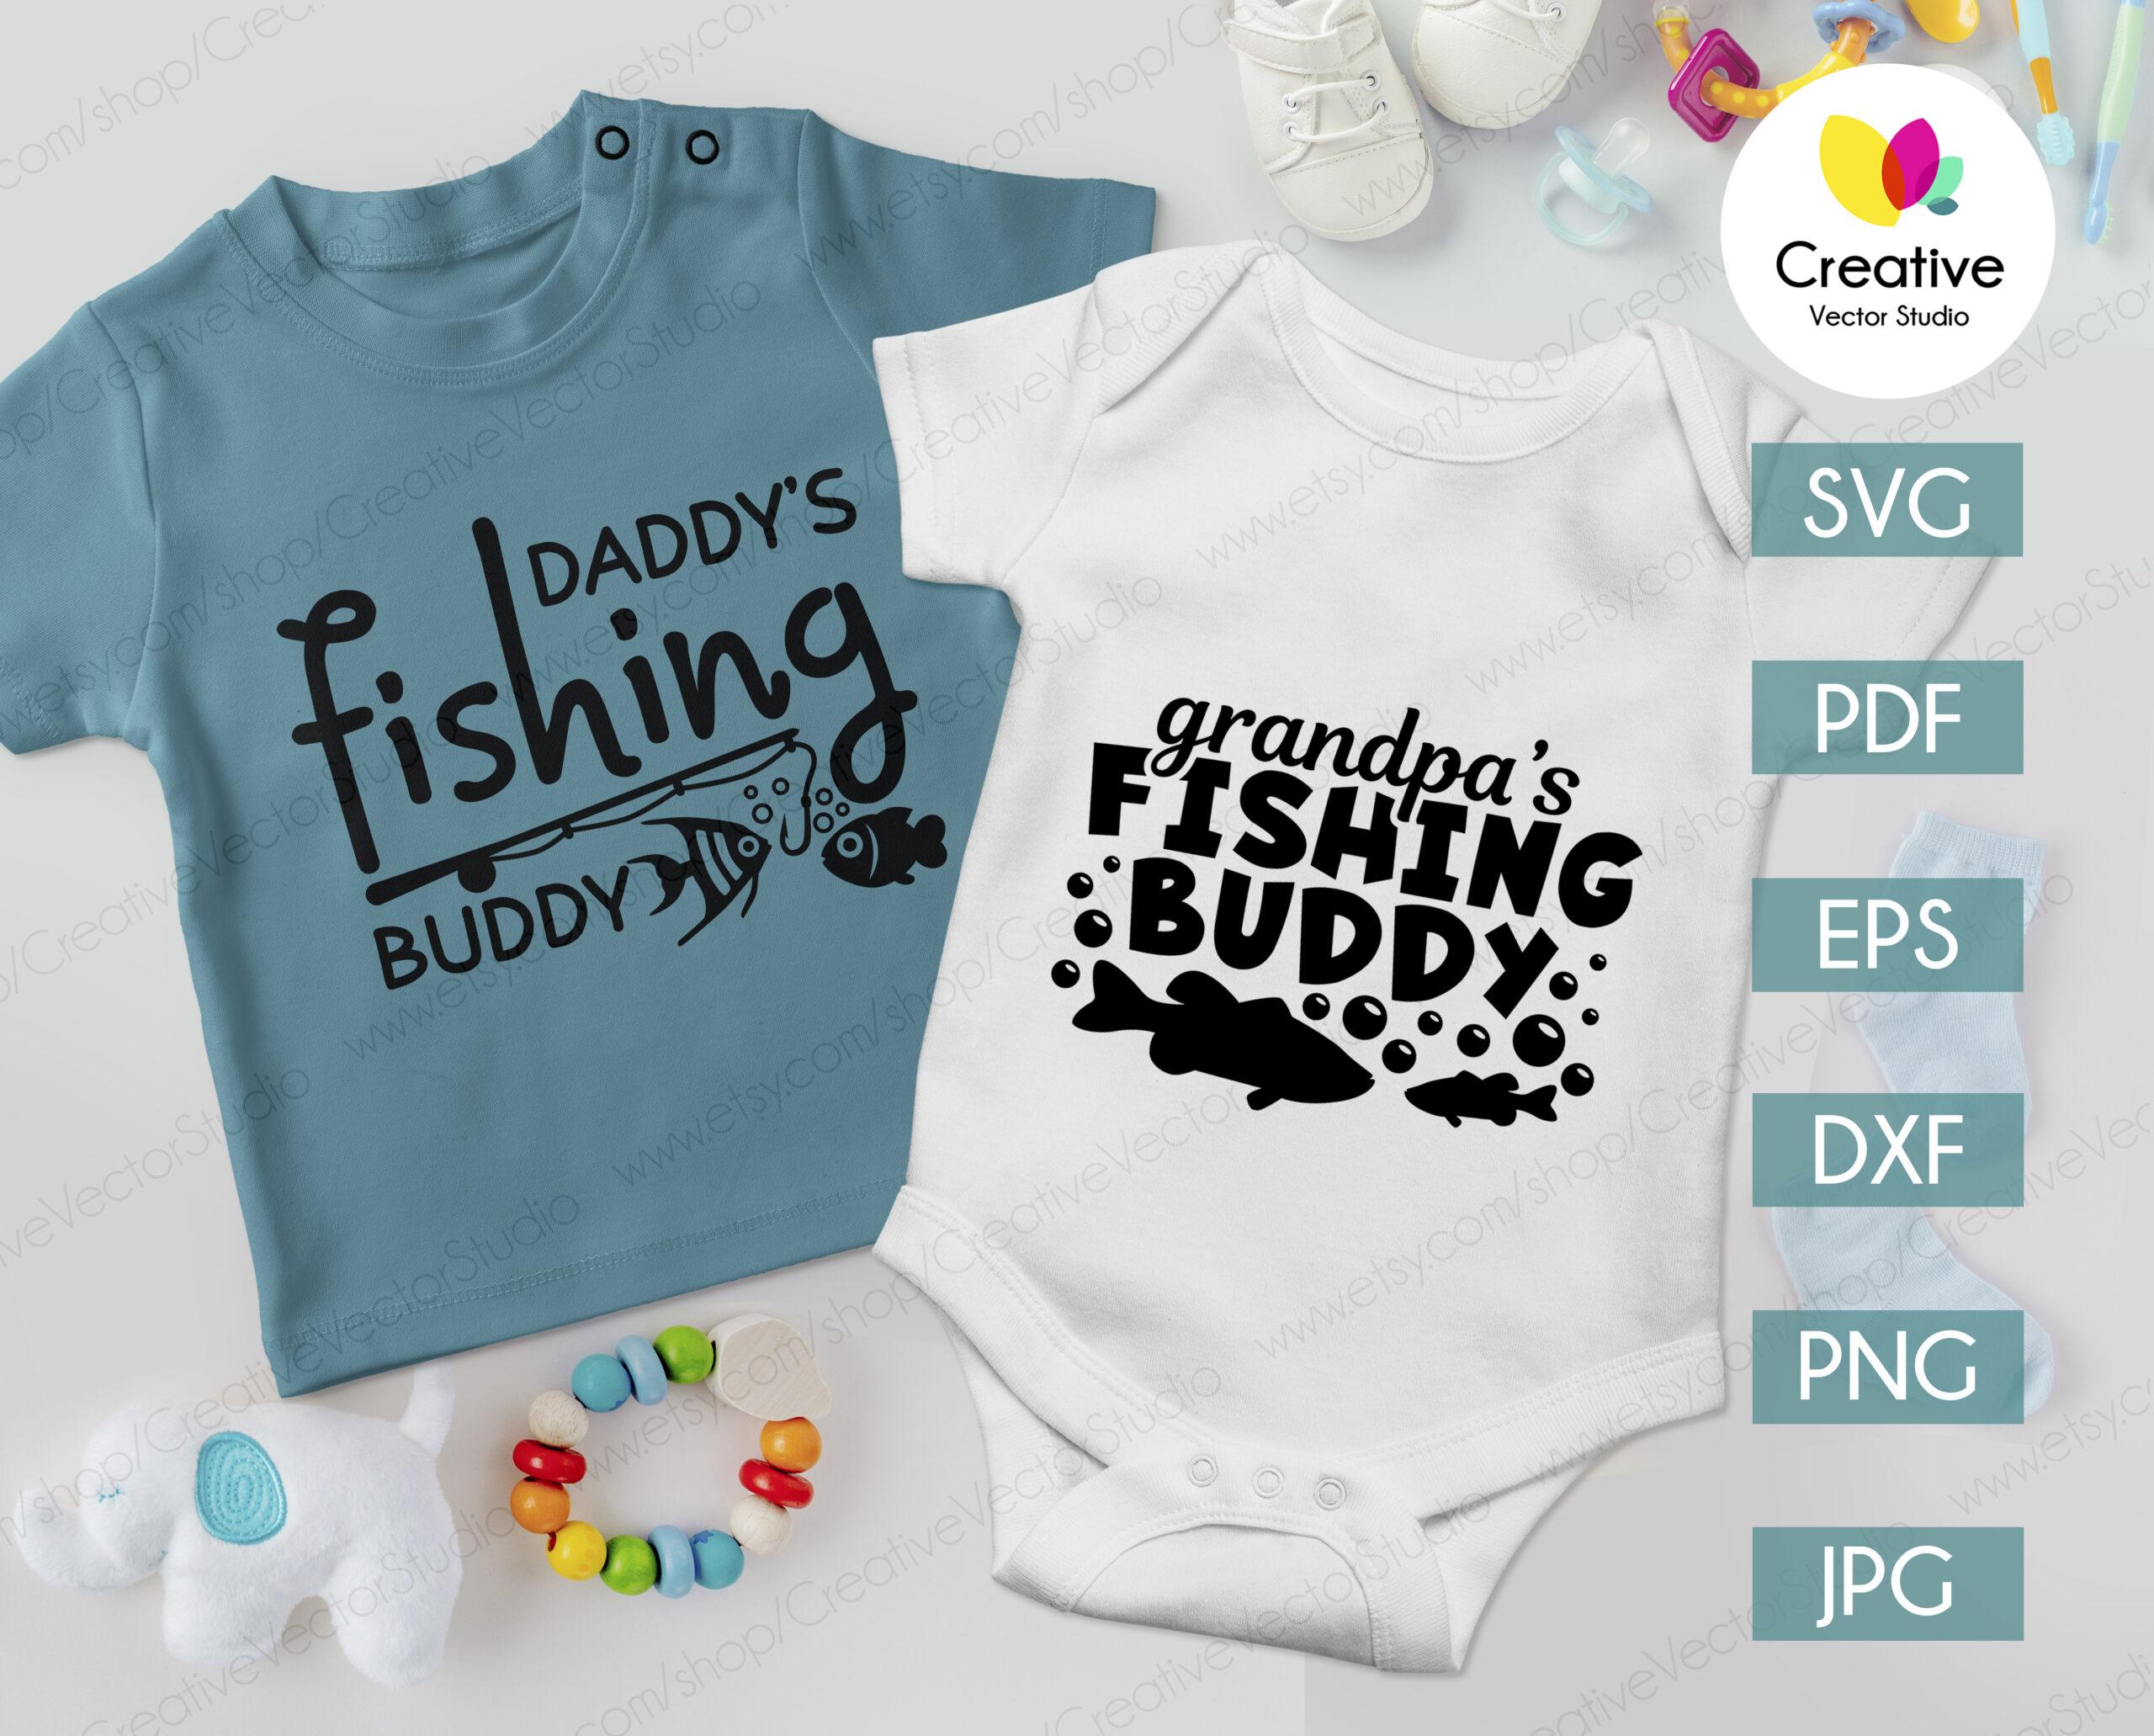 Download Fishing Svg Bundle Cut File Images Creative Vector Studio